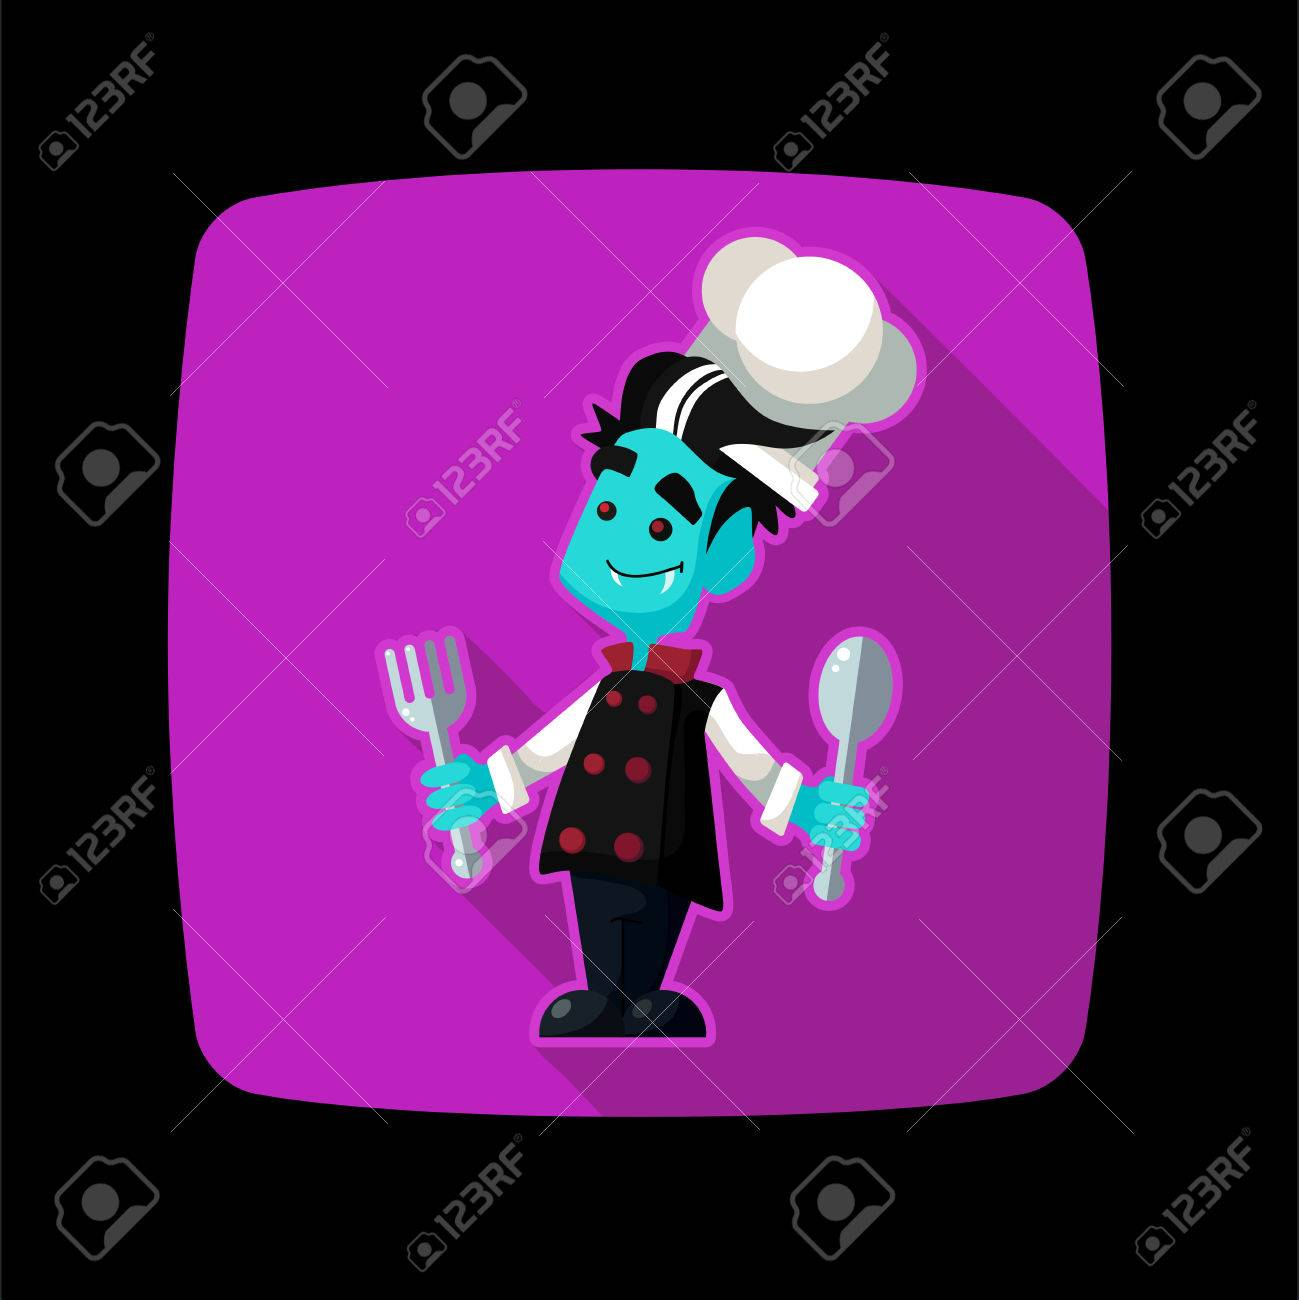 Carre Plat Icone Vecteur Avec Vampire Cuisinier Et D Ustensiles De